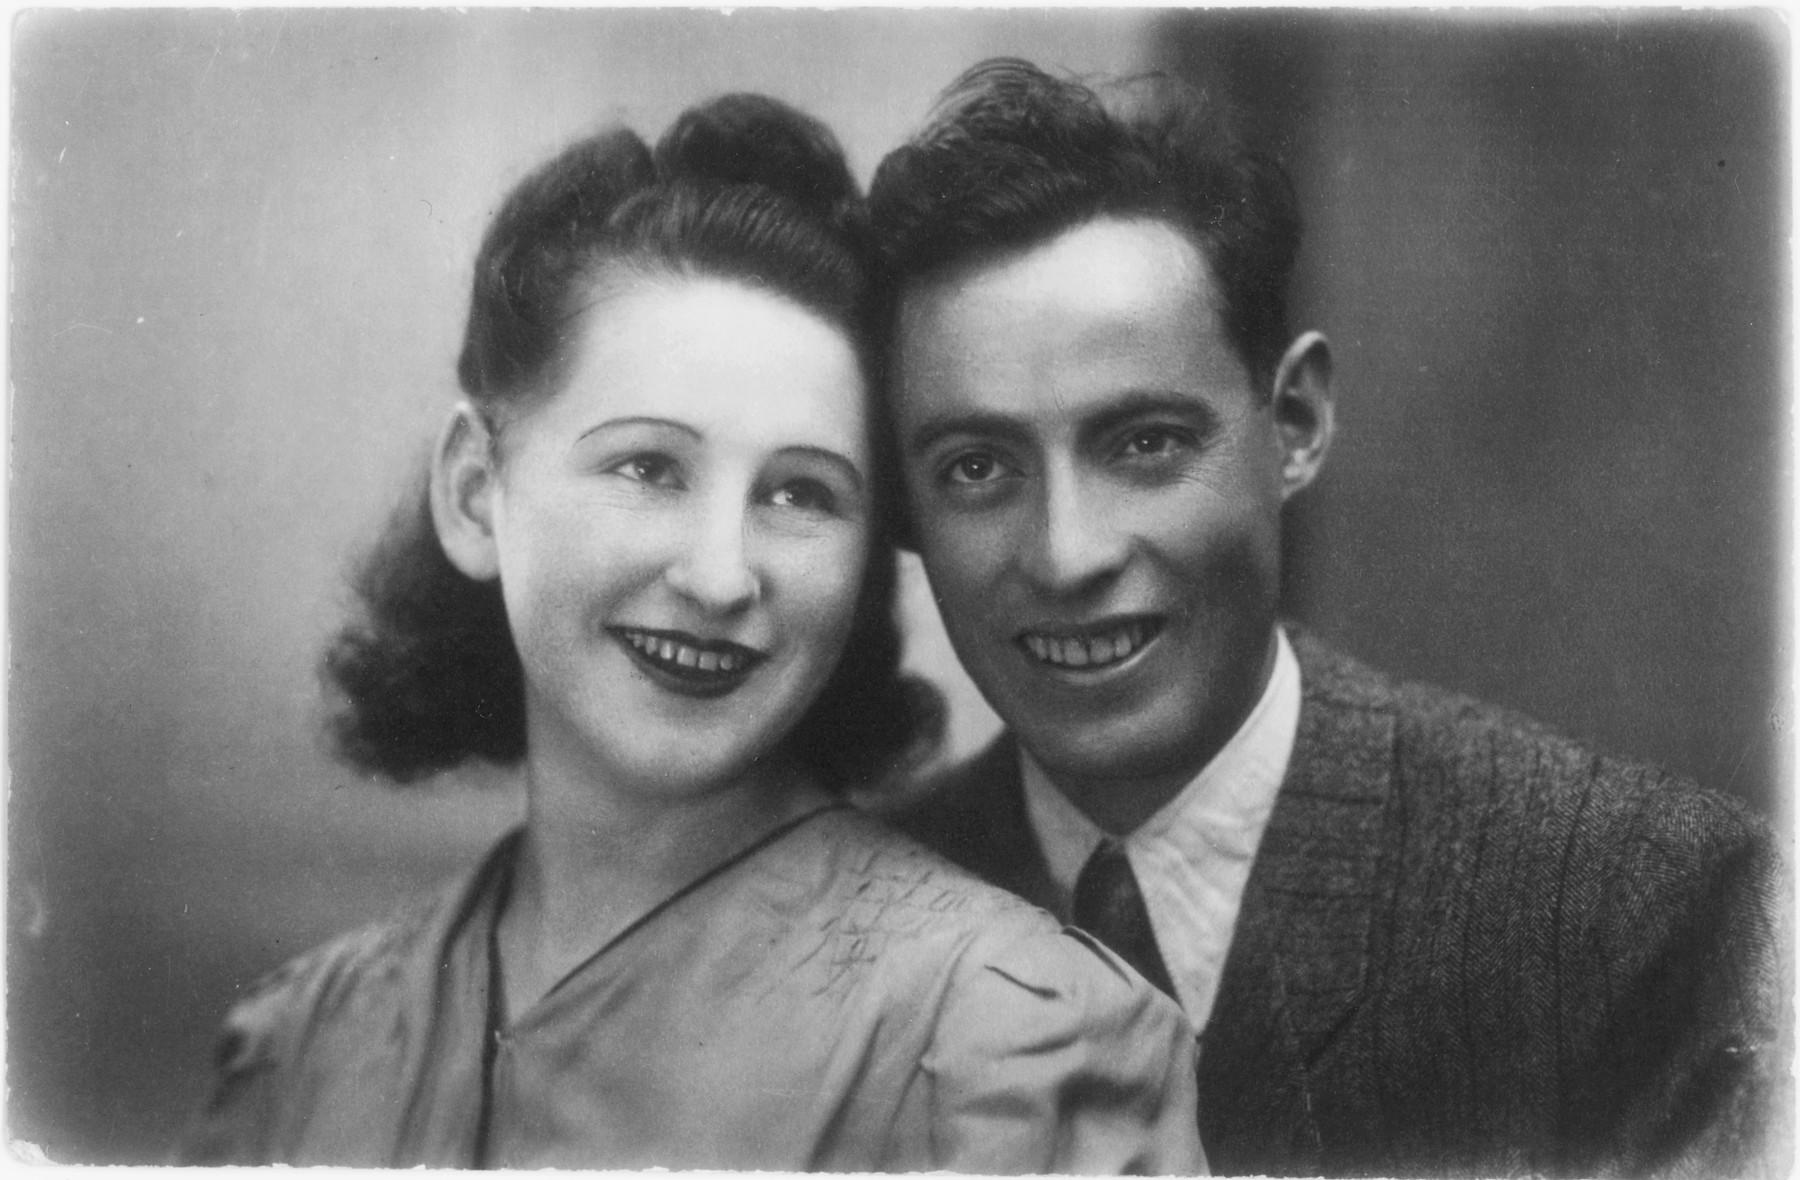 Studio portrait of a Jewish couple in postwar Warsaw.  Pictured are Rywa Gordon and her husband Izak Wertman.